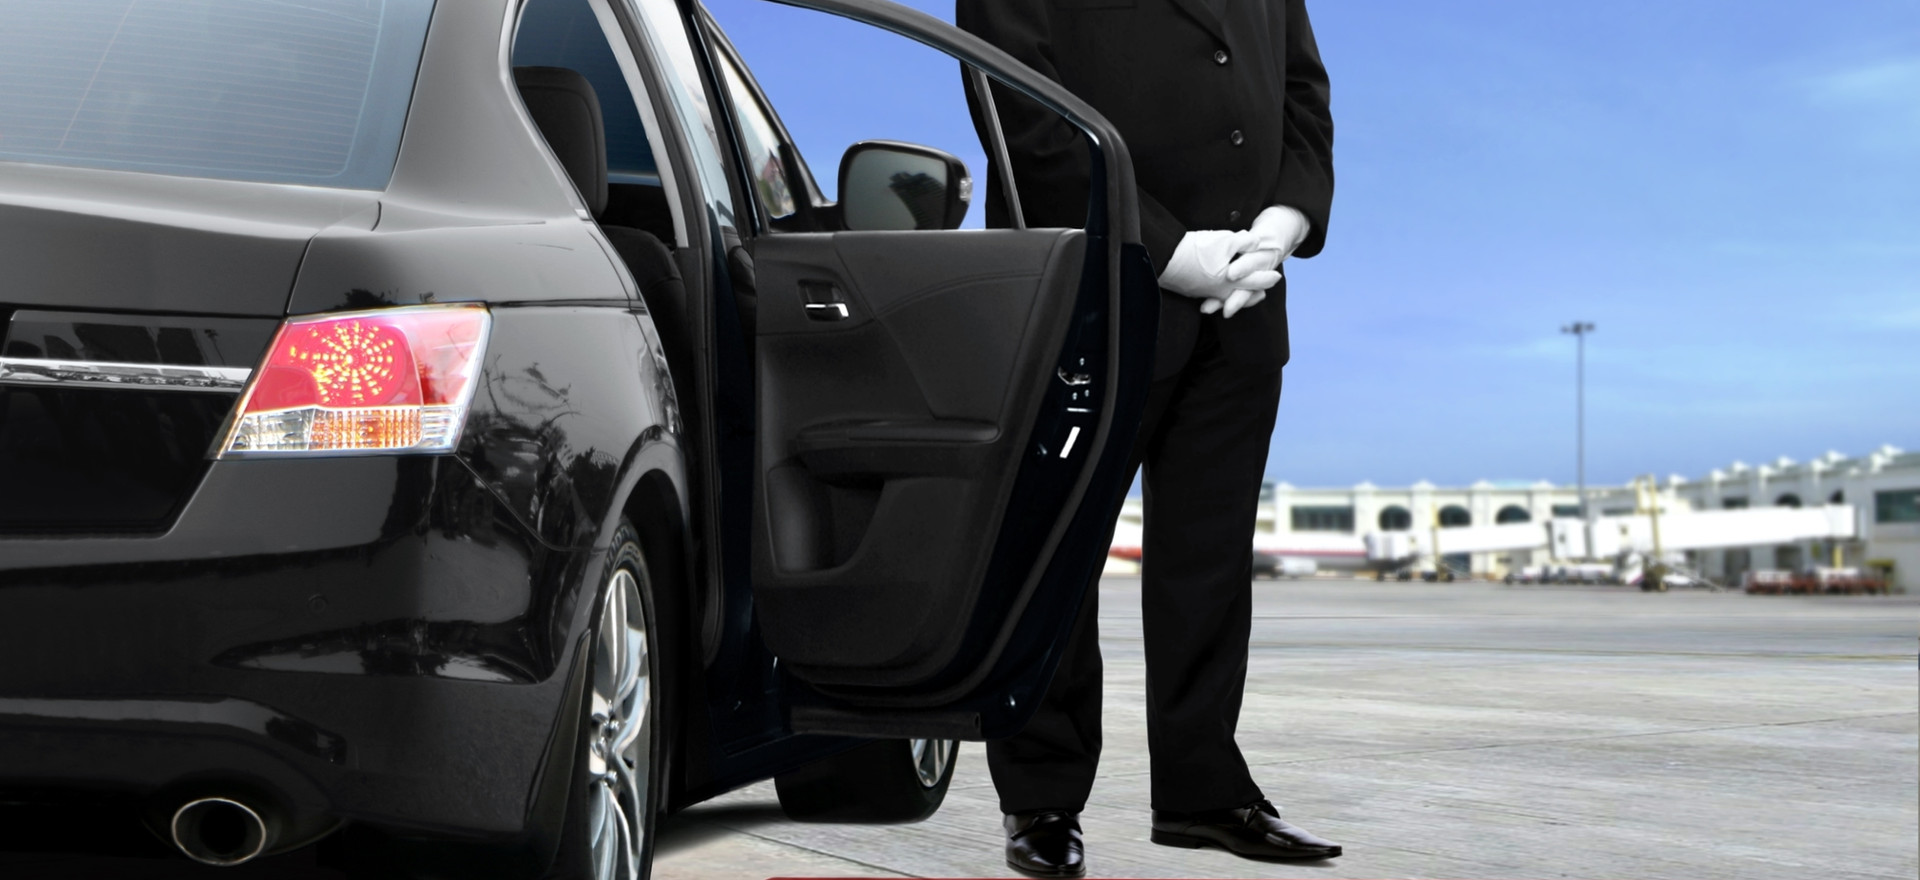 Chauffeur Waiting for Client